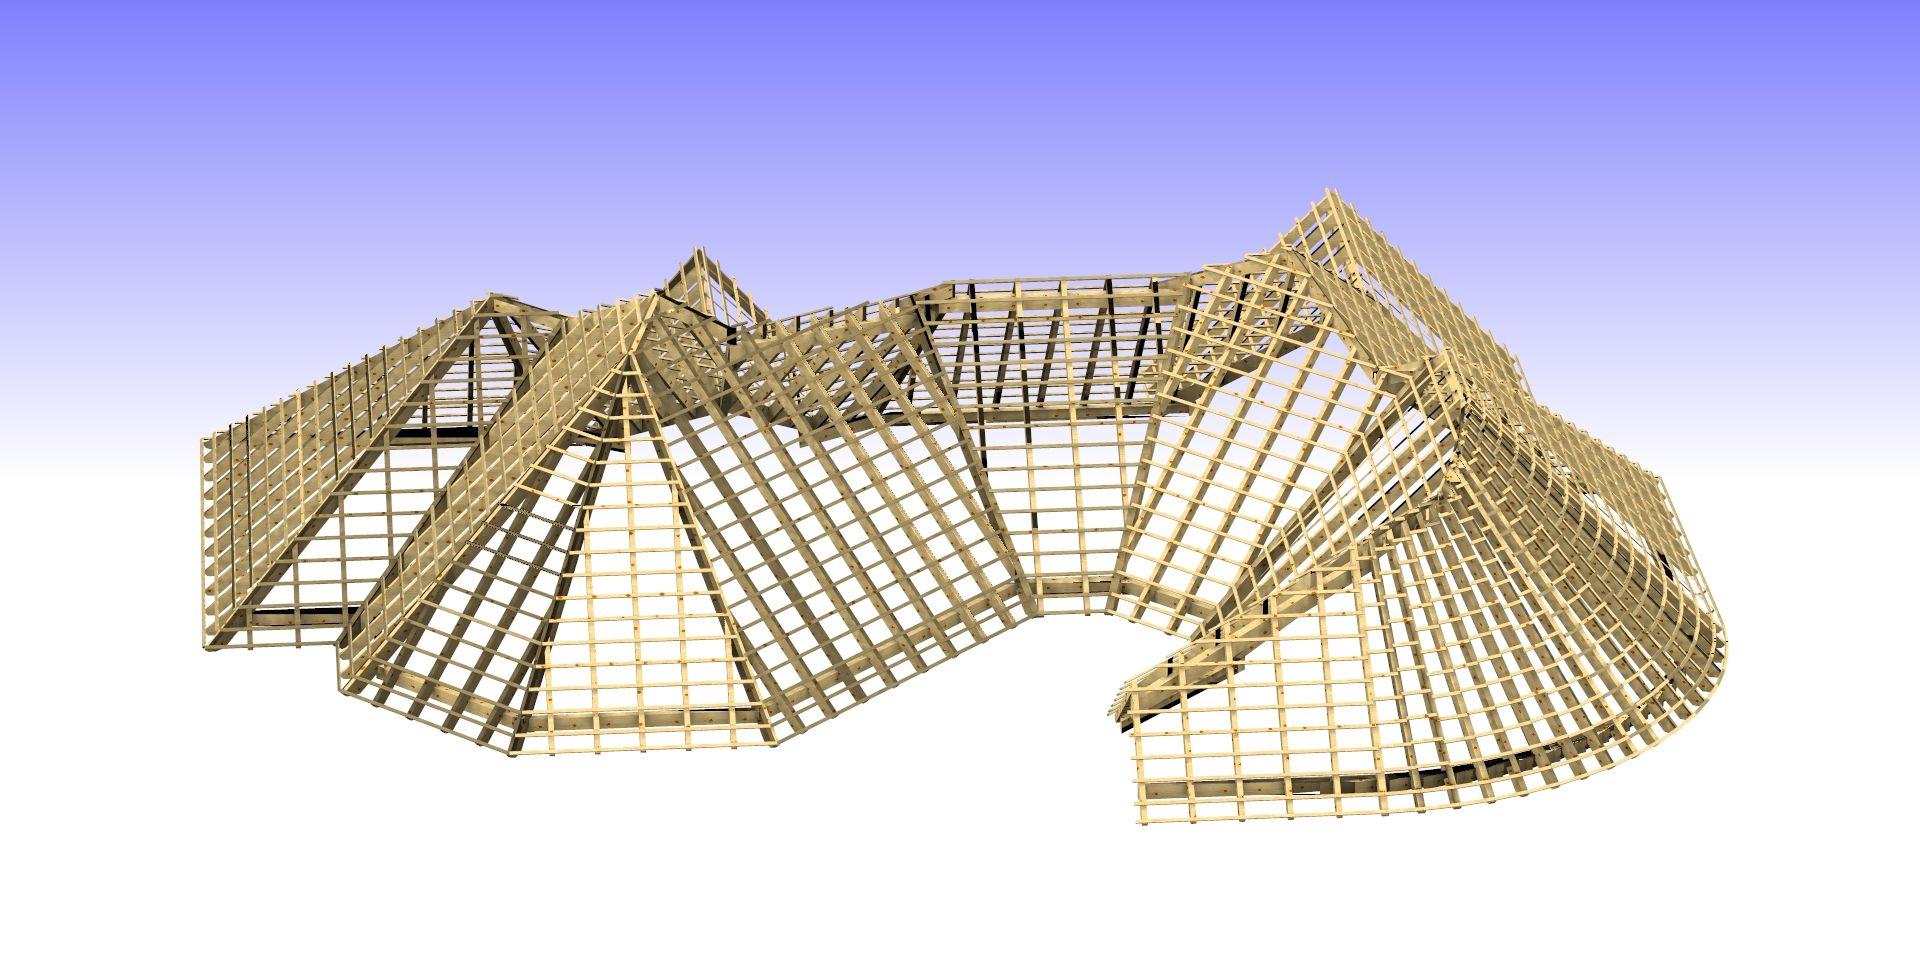 Dachstuhlkonstruktion Fur Maschinellen Abbund Durch Hundegger K2i